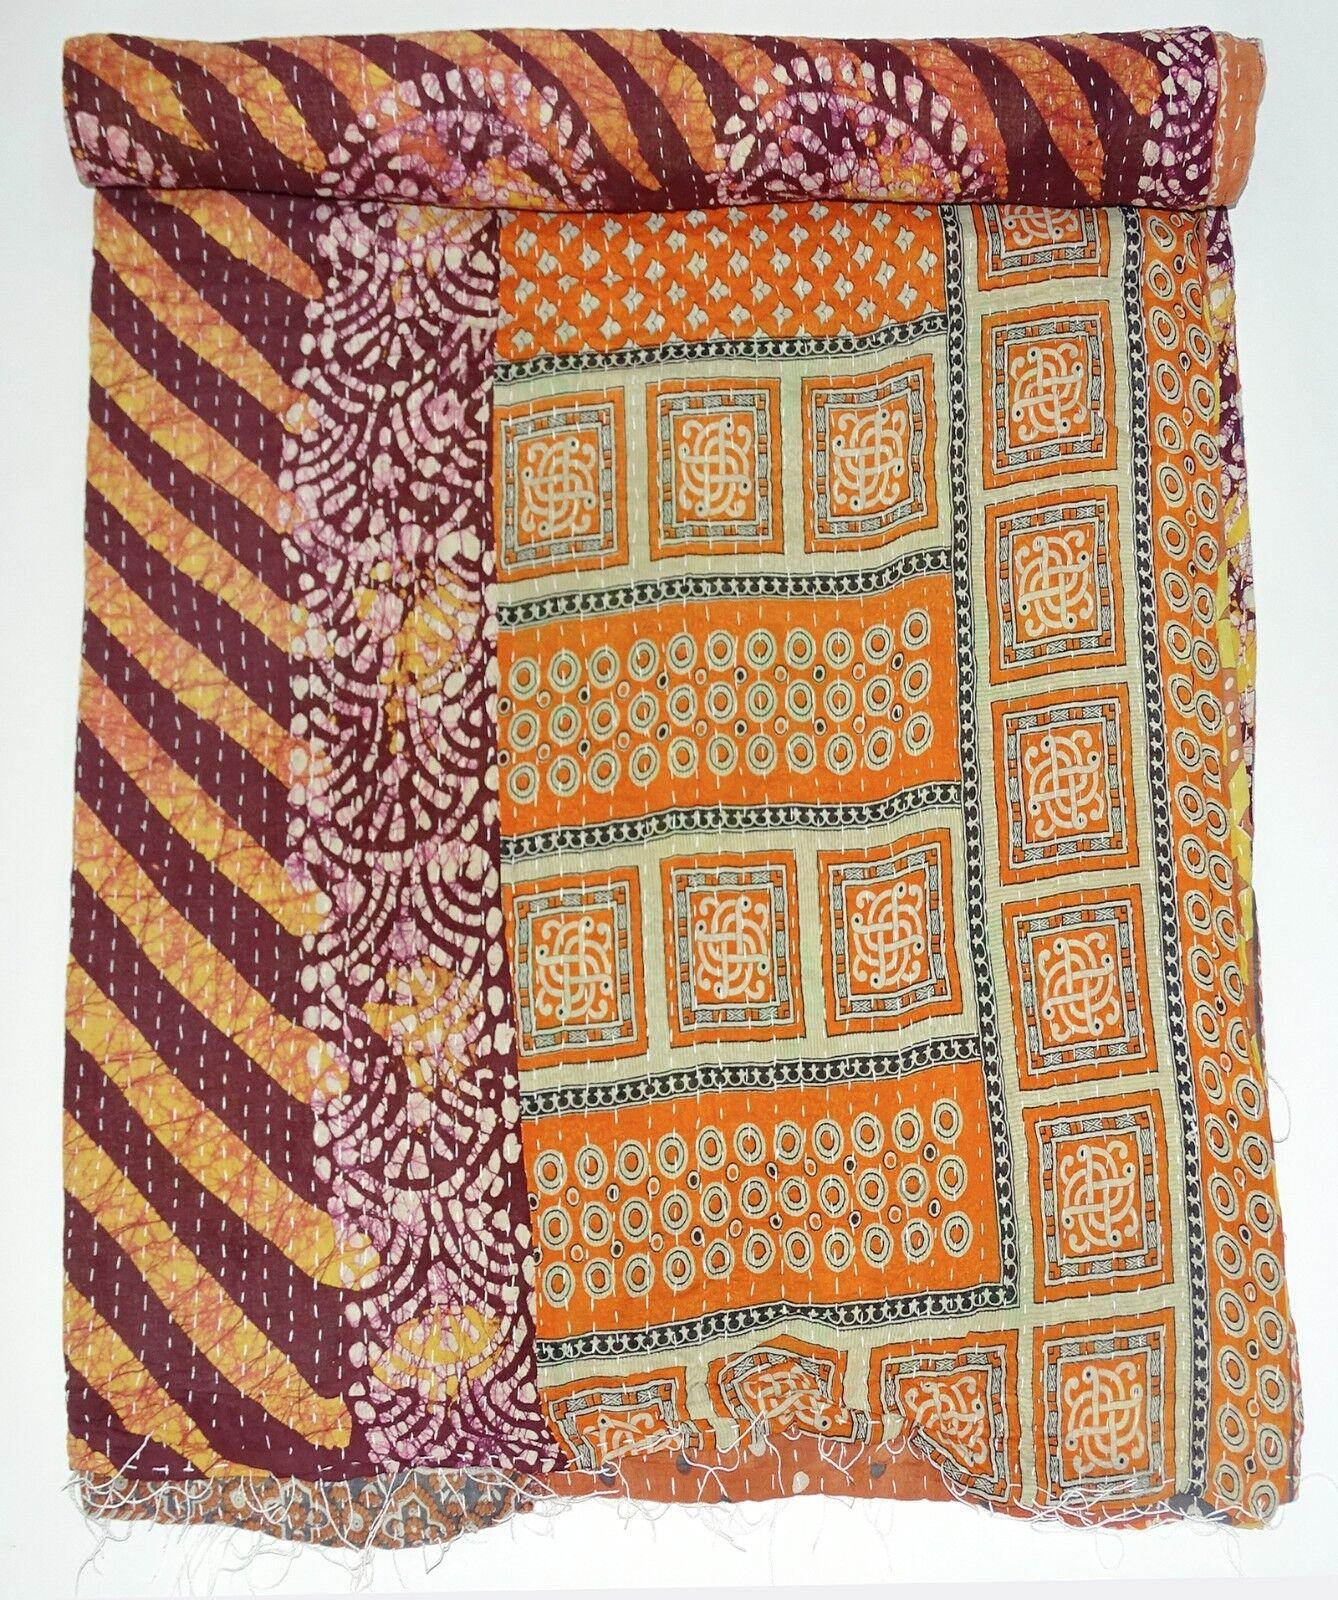 Indian Vintage Kantha Quilt Bedspread Reversible Handmade Cotton Throw Bedsheet